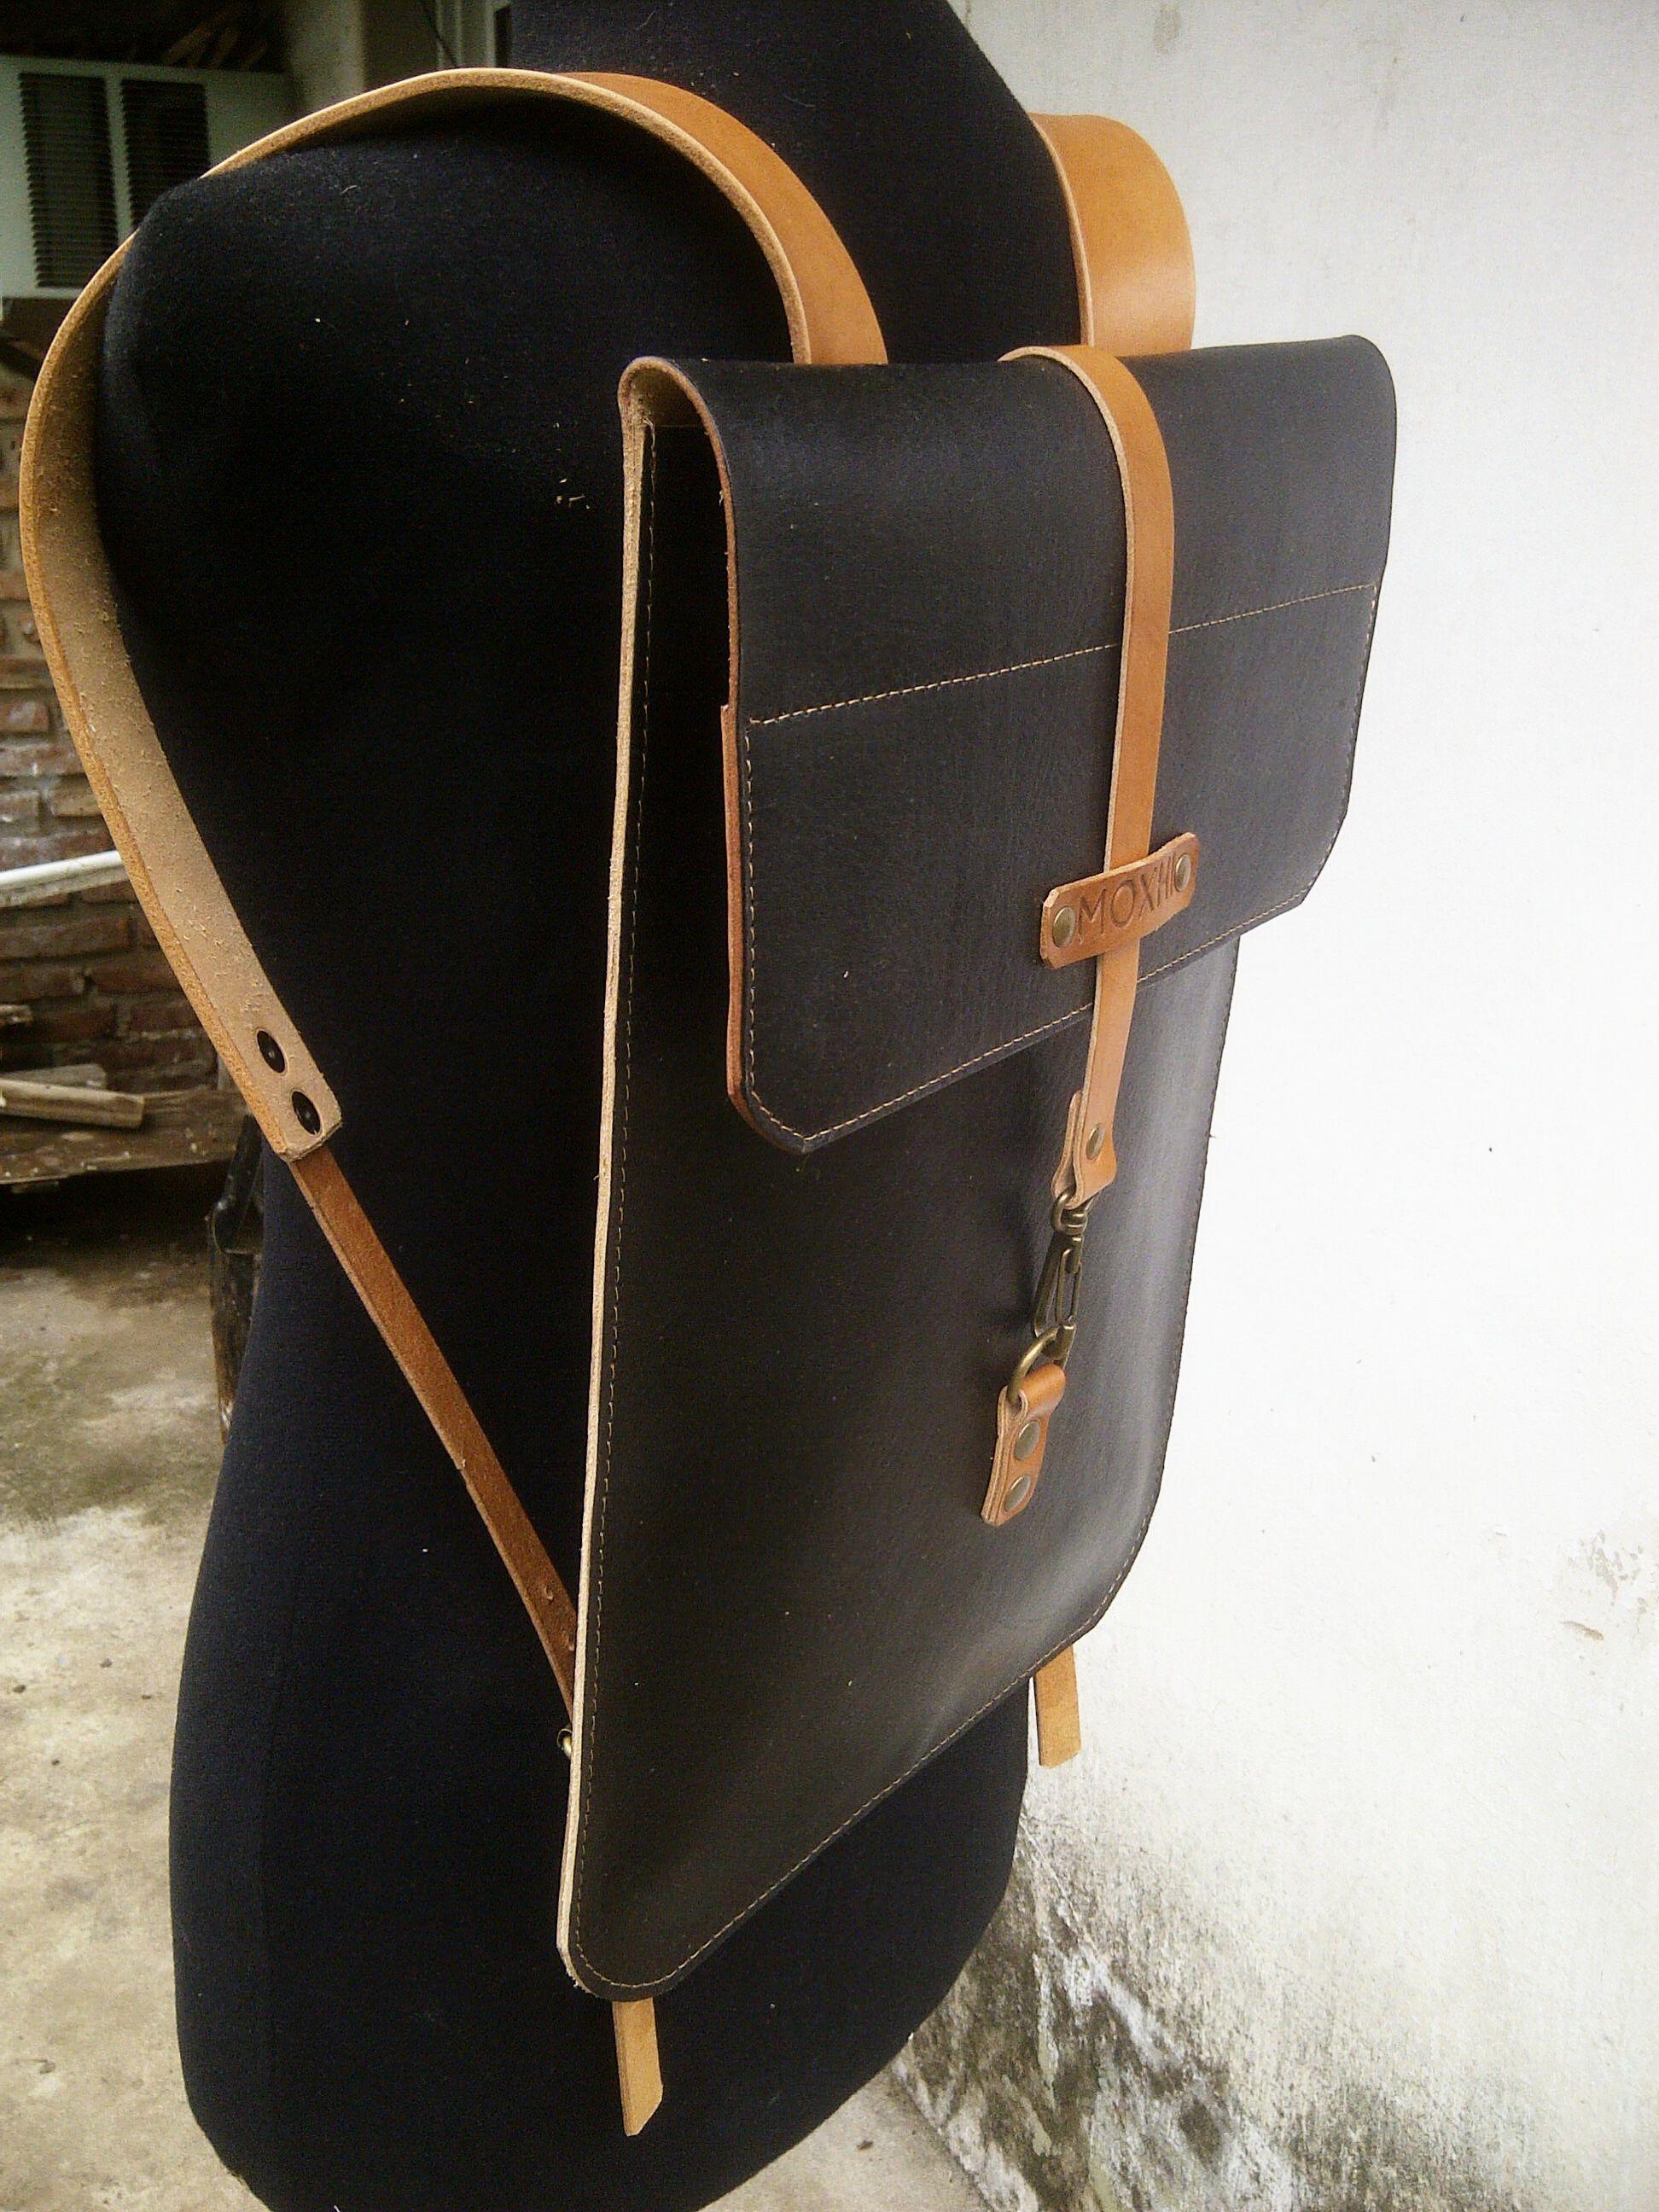 80bdb9aaee69 Slim leather backpack Мужской Рюкзак, Кожаные Изделия Для Мужчин,  Аргентина, Рюкзаки